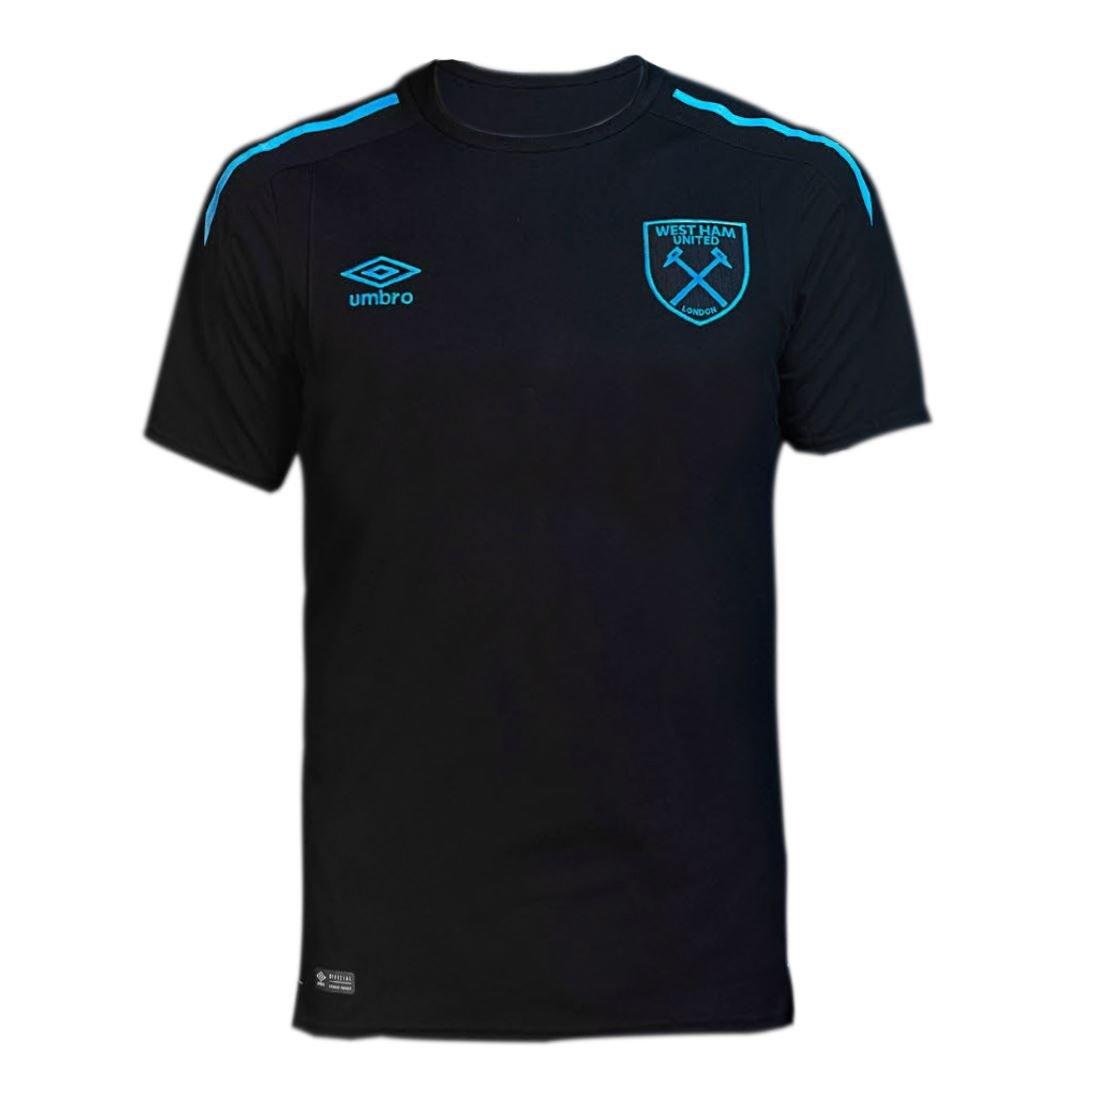 Umbro 2017-2018 West Ham Away Football Soccer T-Shirt Trikot (Kids)